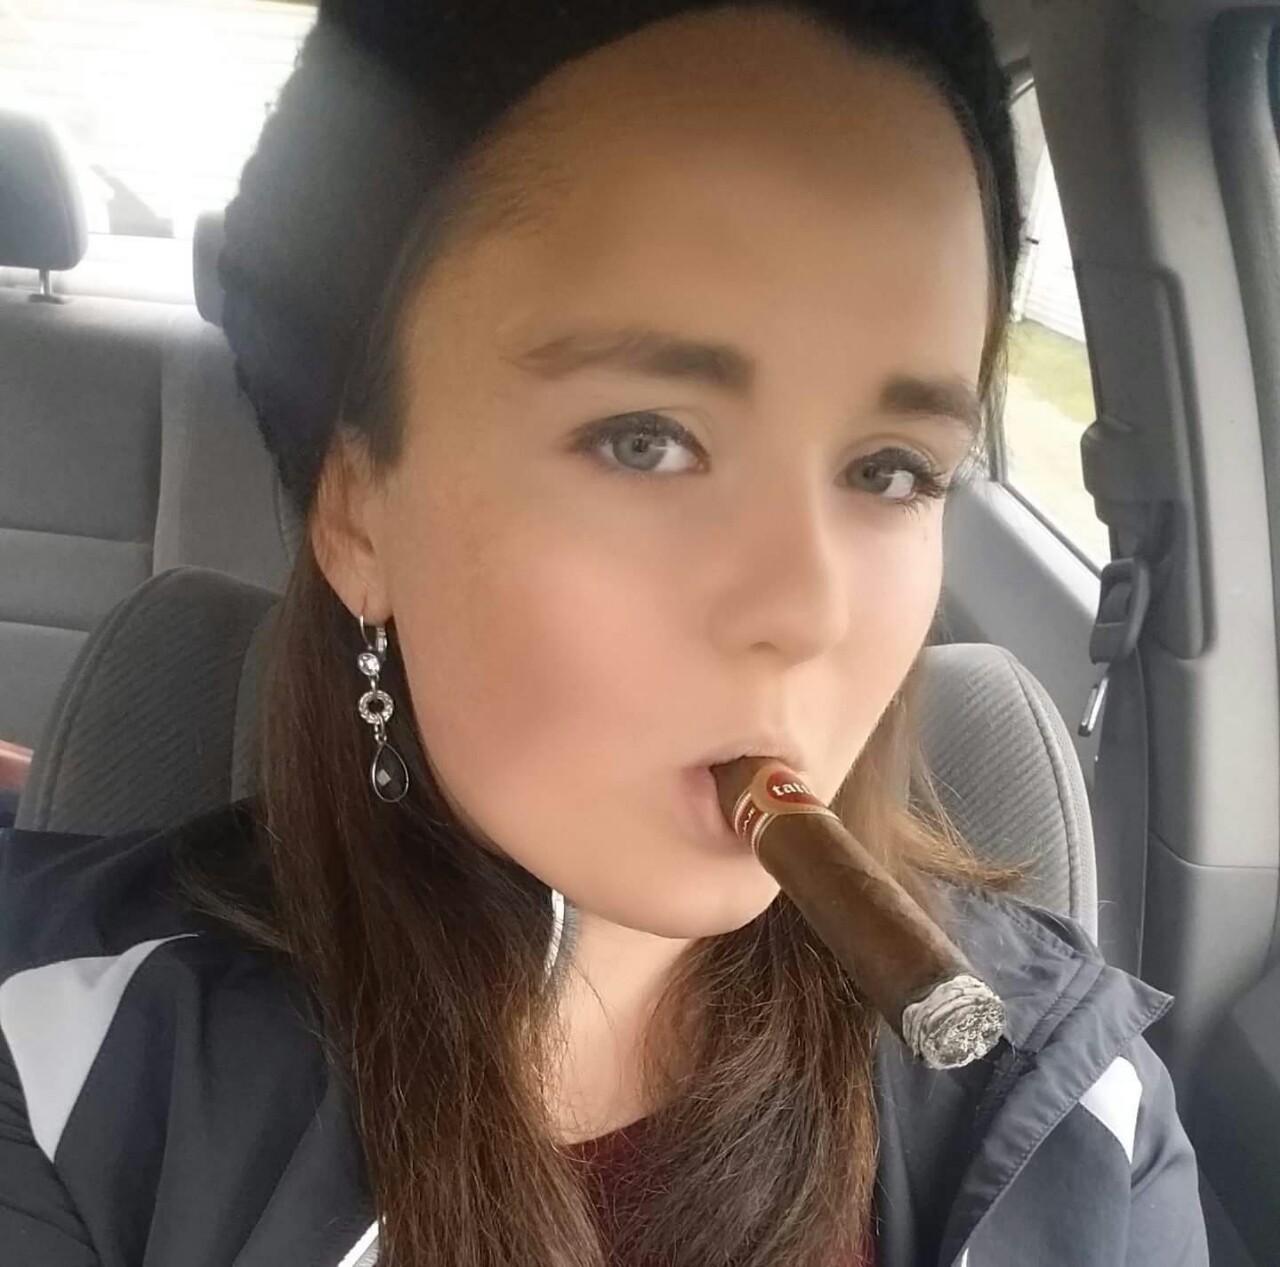 Amatuer Ladies Happy Cigar Smoking 100 Hot Pics Cigar Monkeys